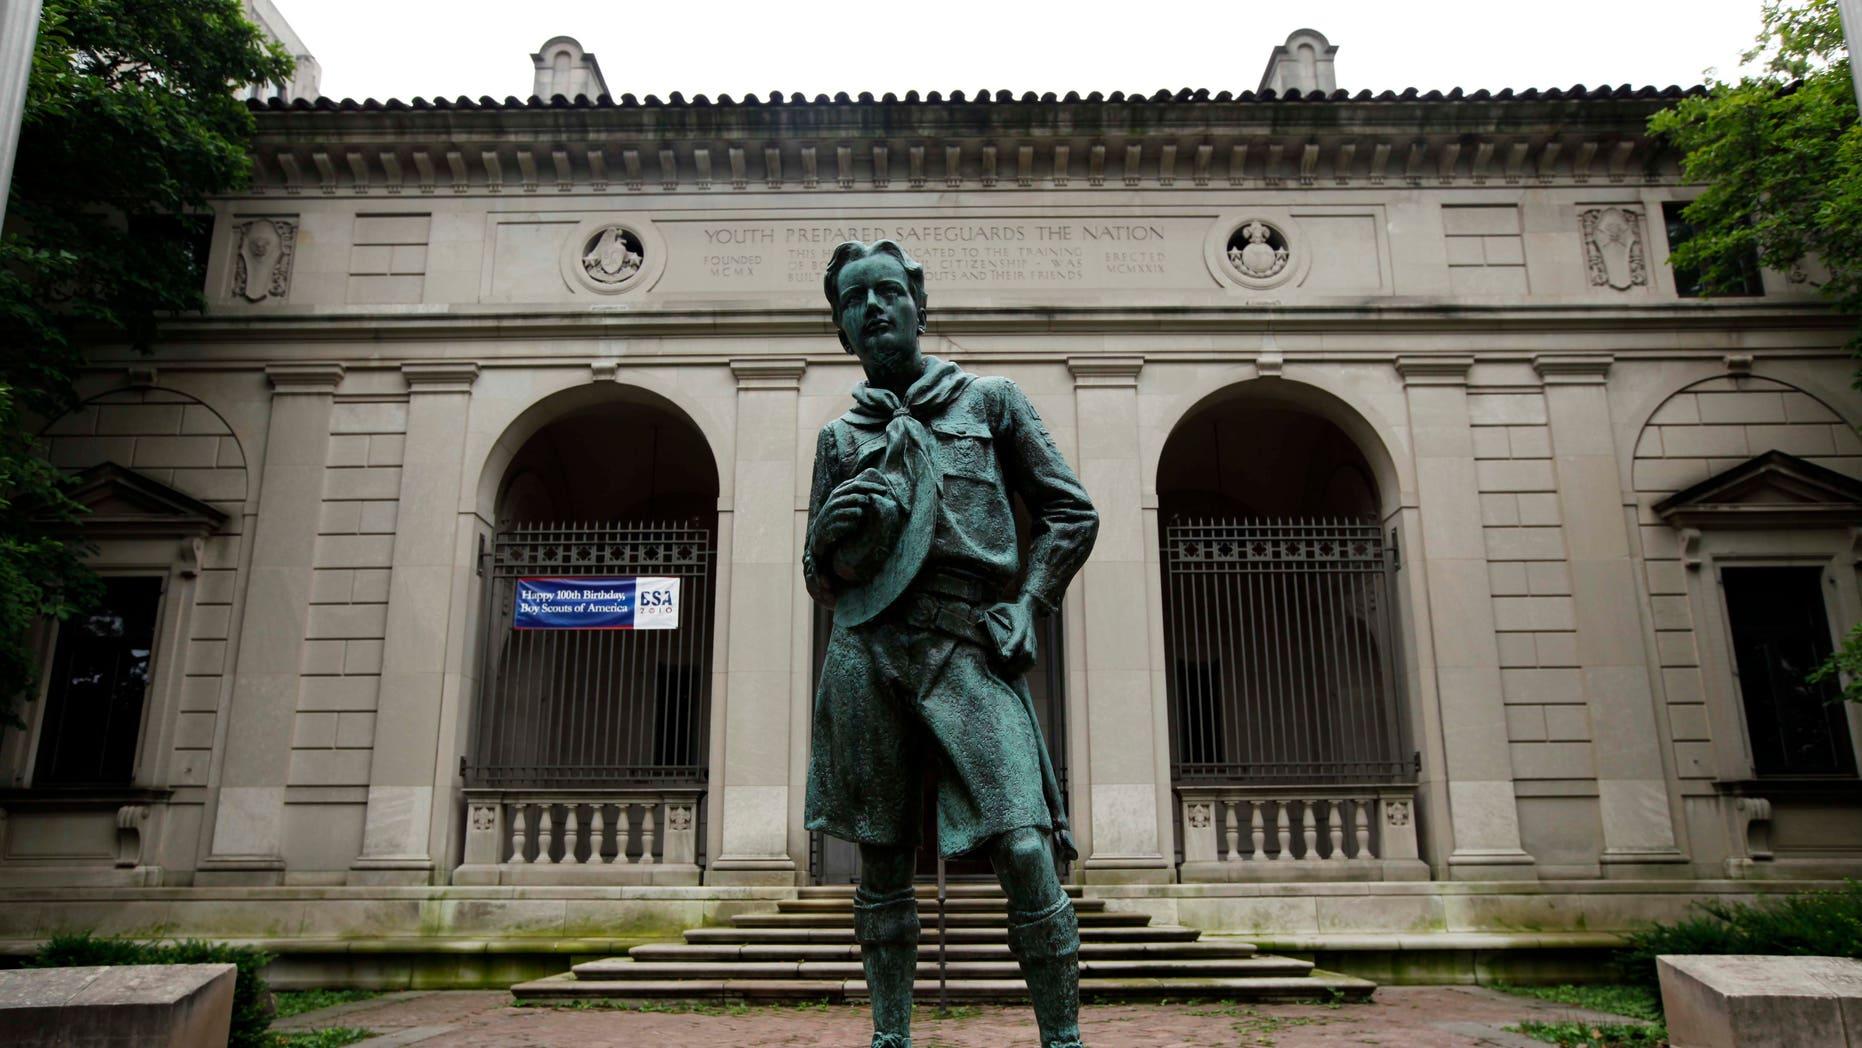 June 14, 2010- City-owned Boy Scouts headquarters in Philadelphia.